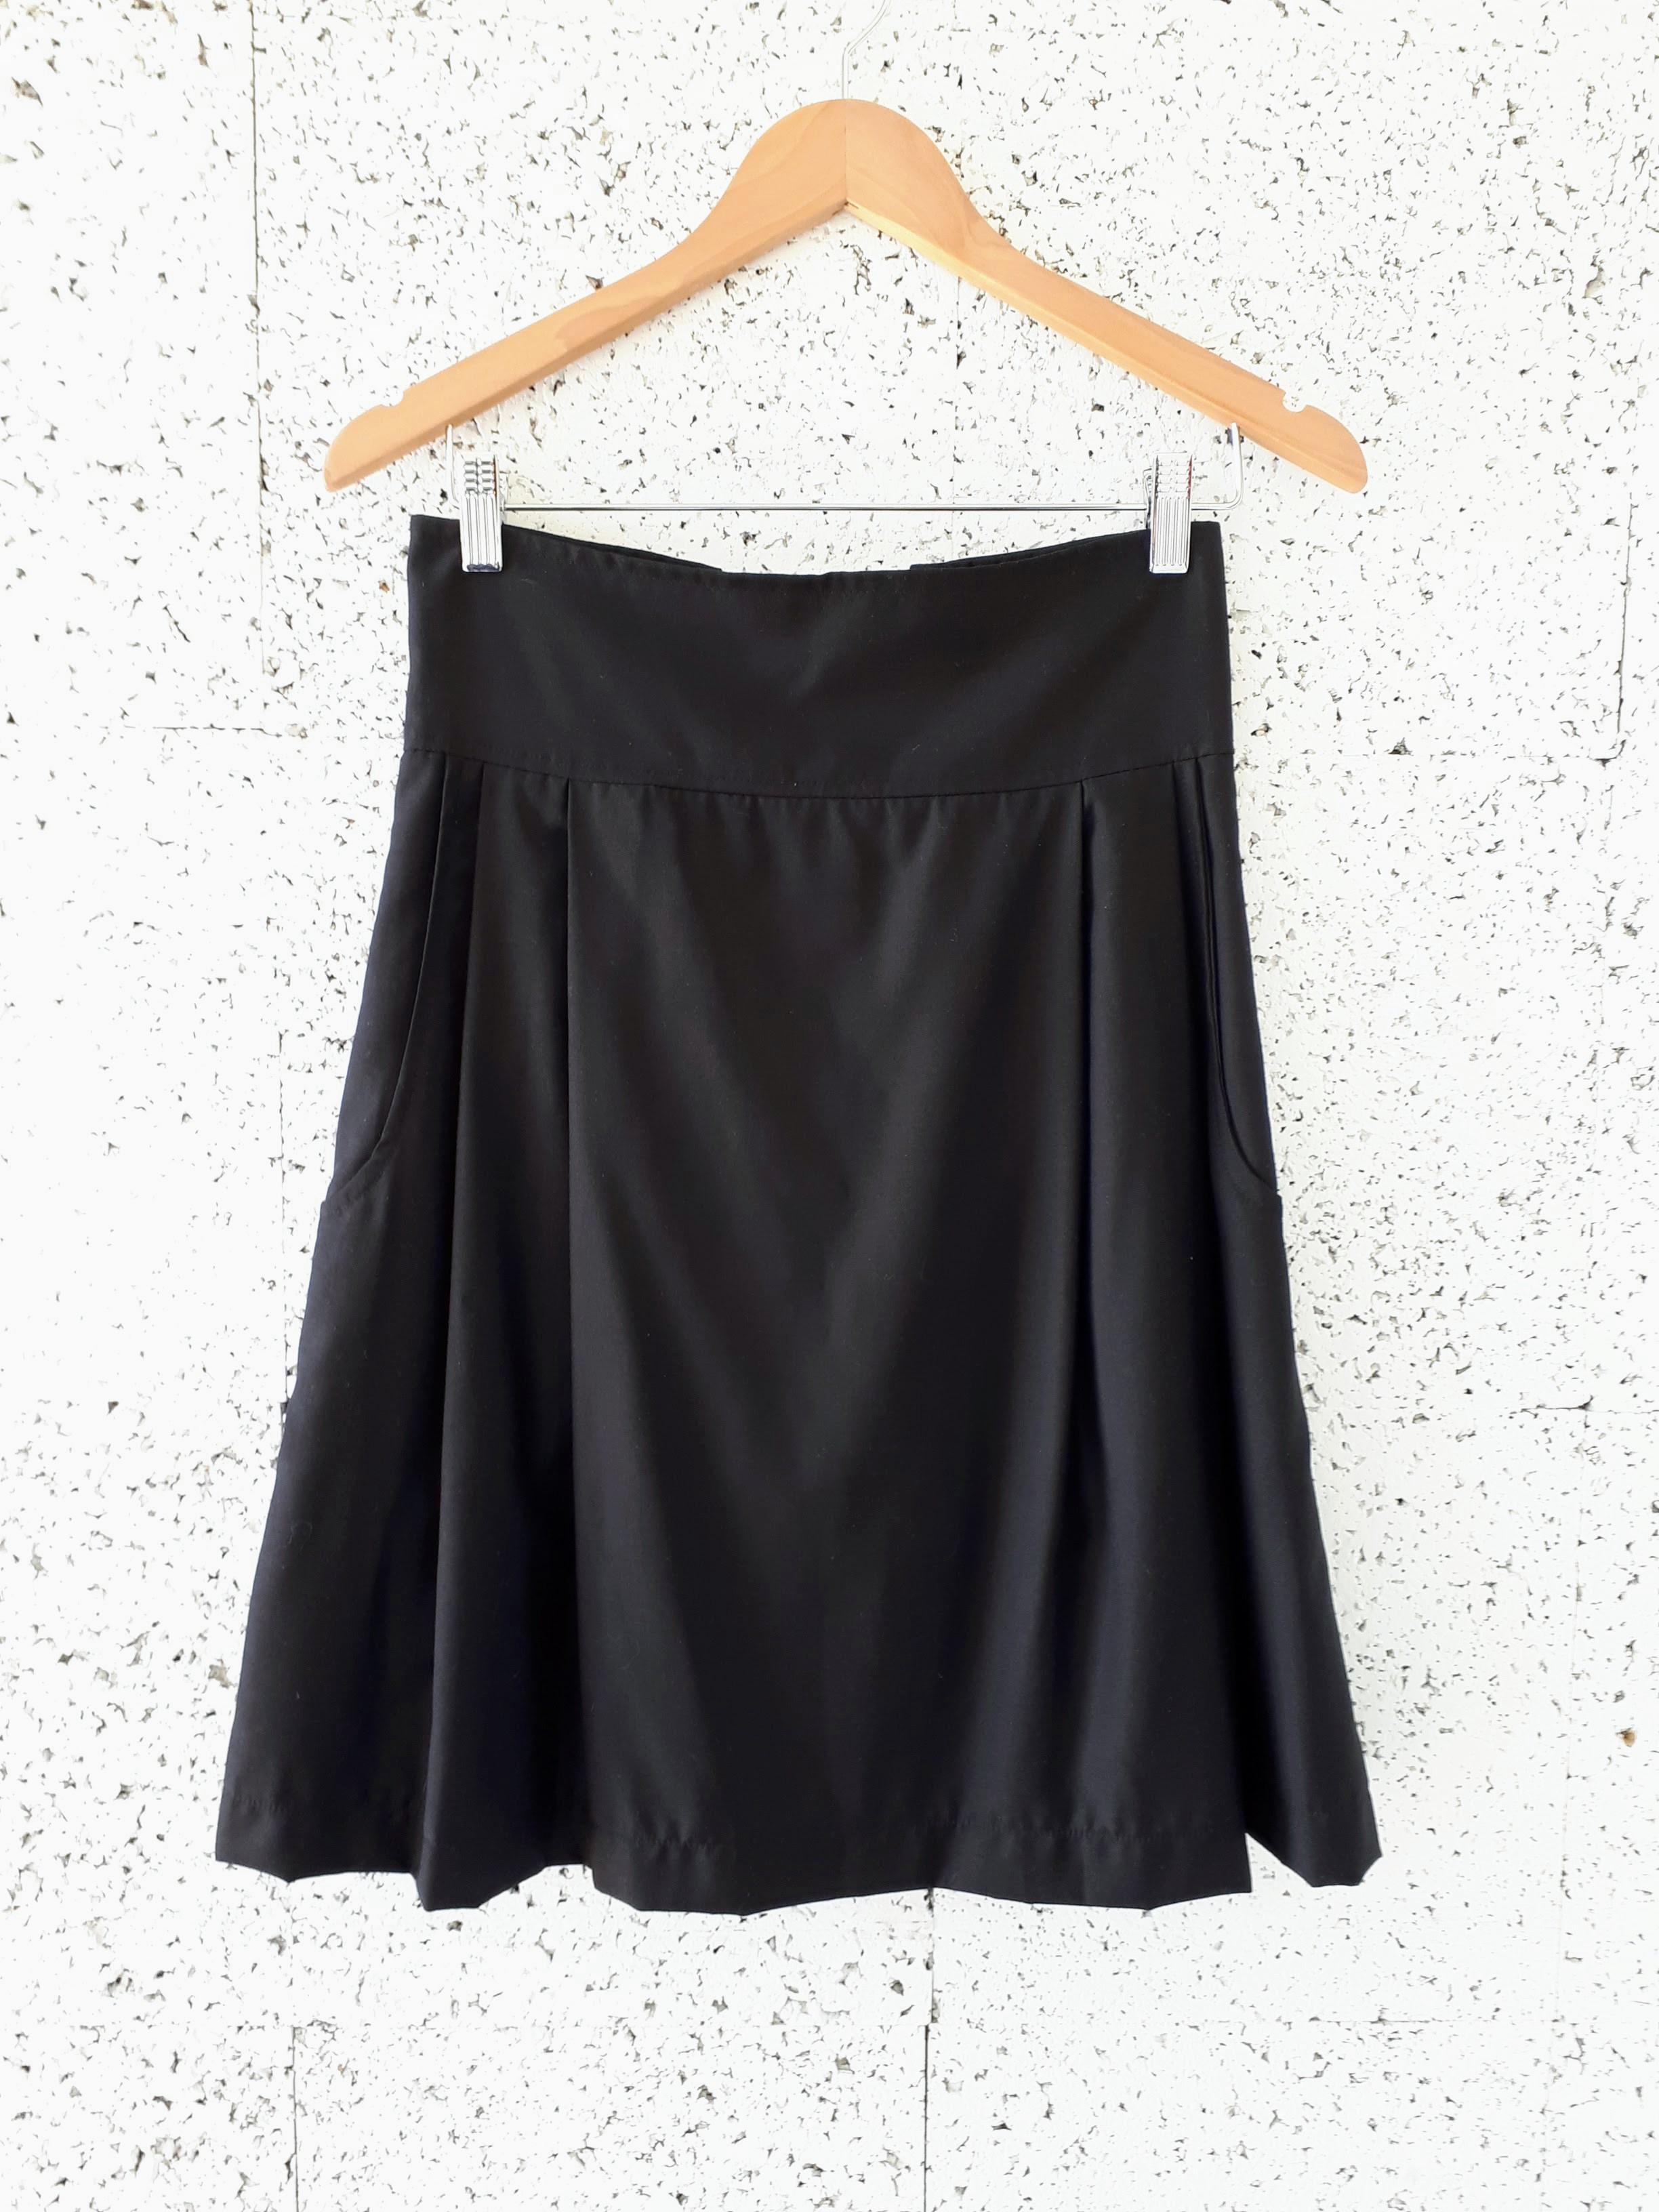 Allison Wonderland skirt; Size S, $30